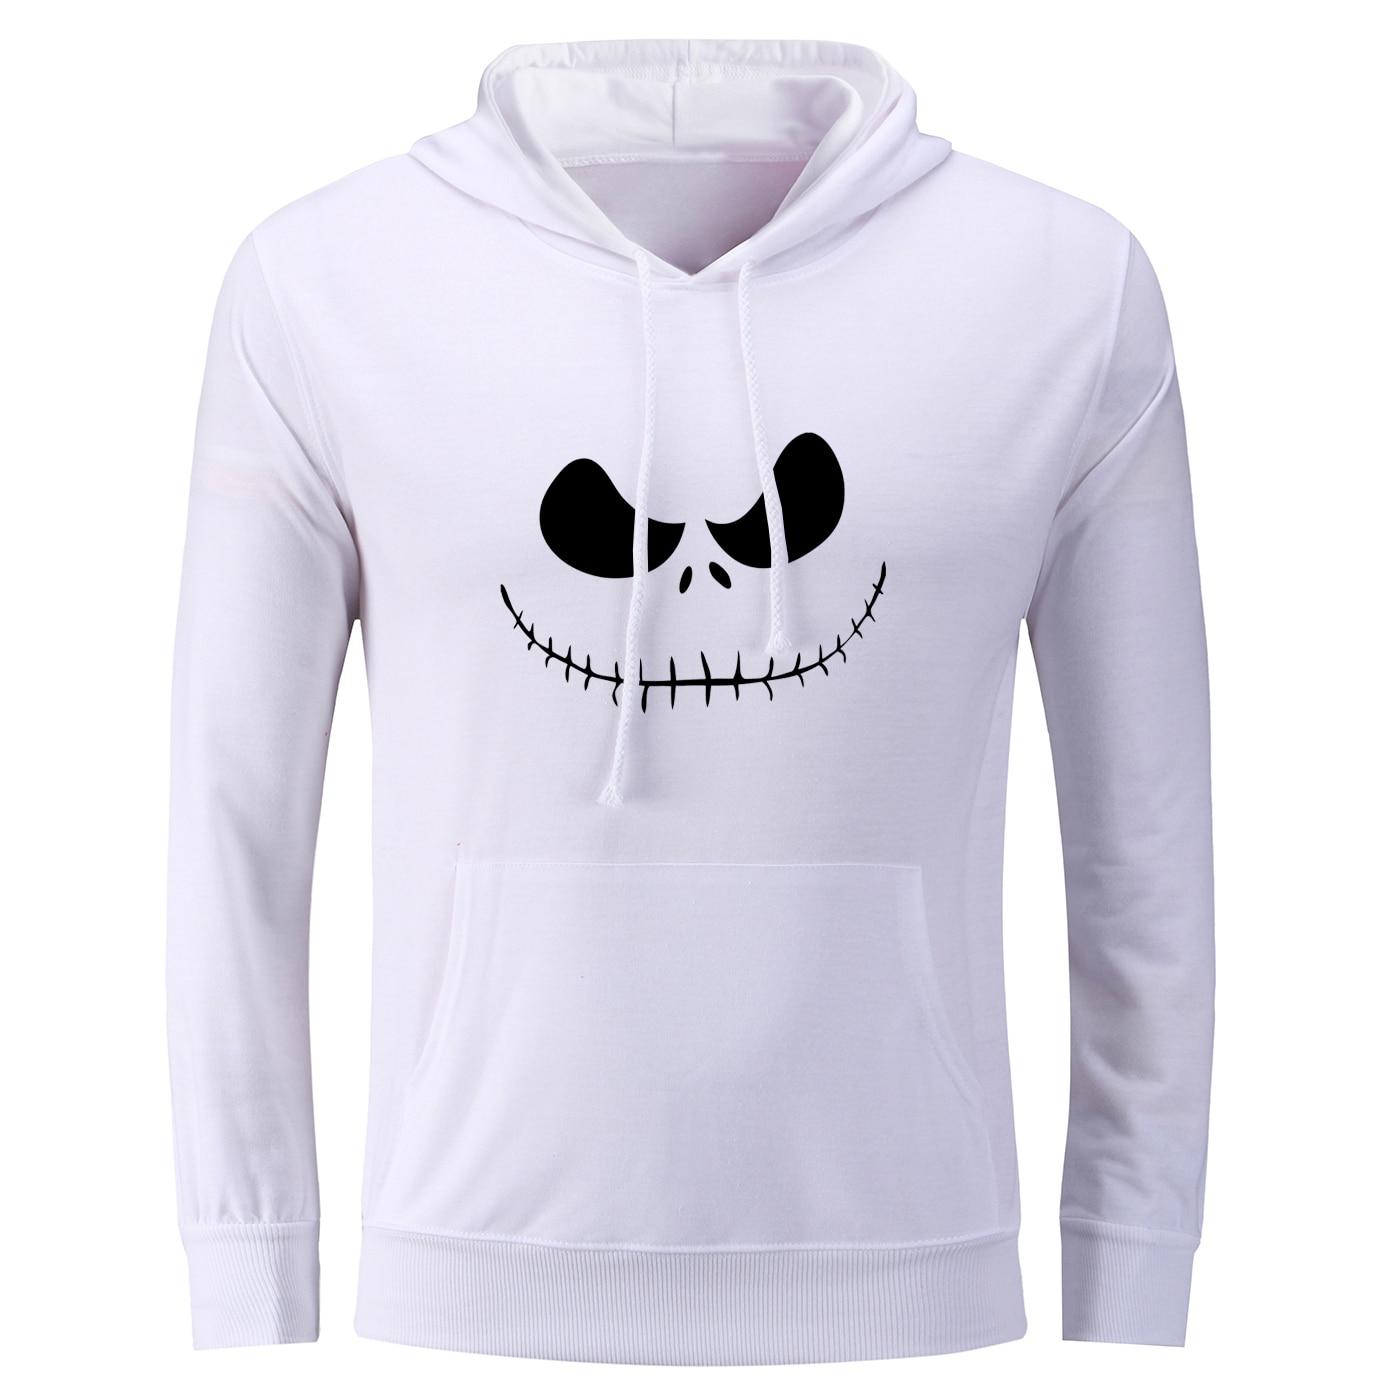 iDzn Womens Printed Hoodies The Nightmare Before Christmas Jack Skellington&Sally Halloween Casual Style Sweatshirts Tops S-3XL